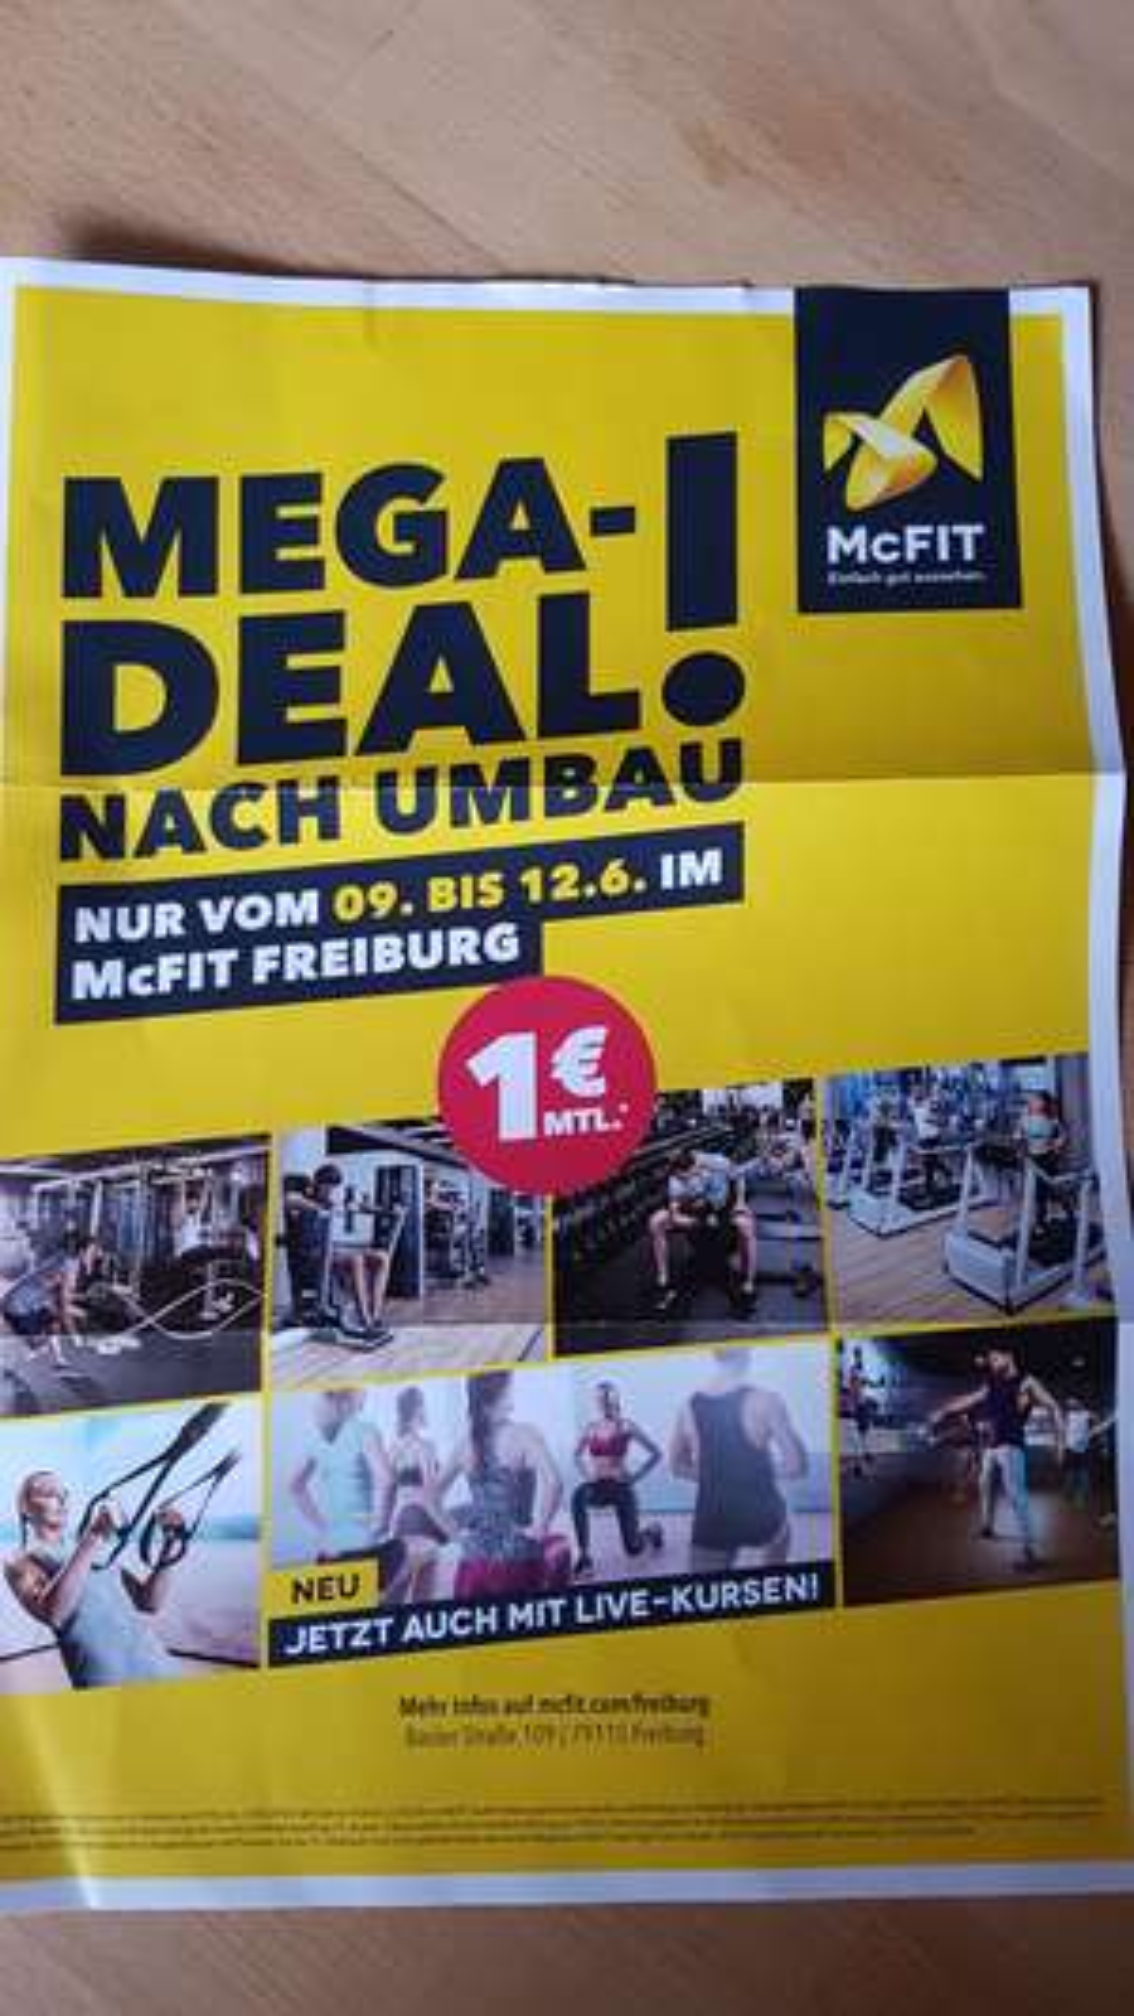 McFit Freiburg (lokal) 12 Monate für 154,40€ Umbauangebot